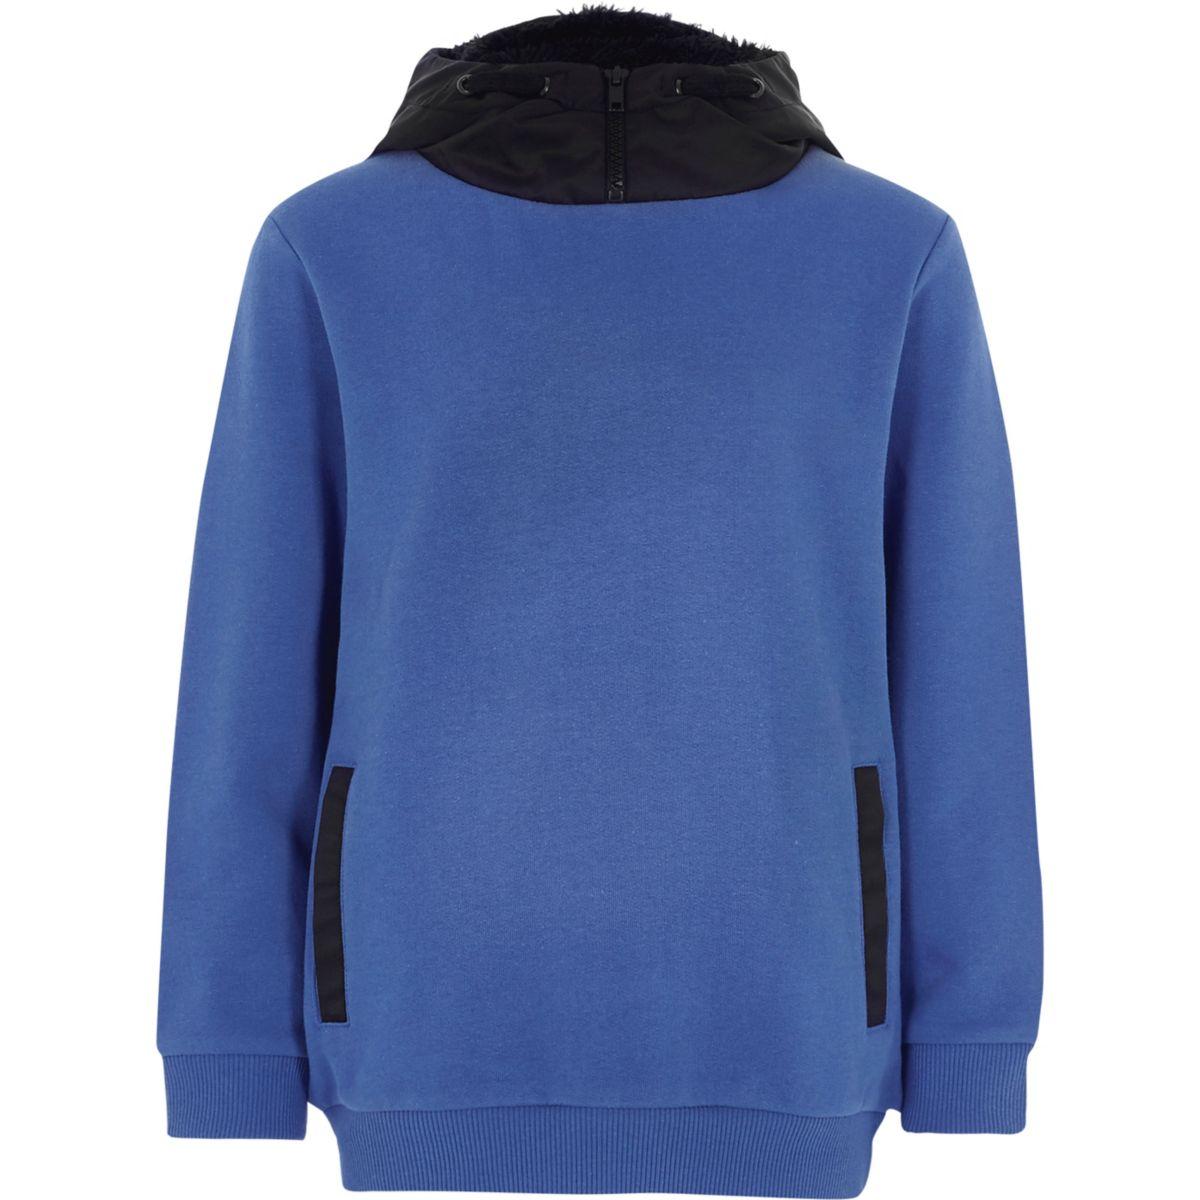 Boys blue hooded sweatshirt